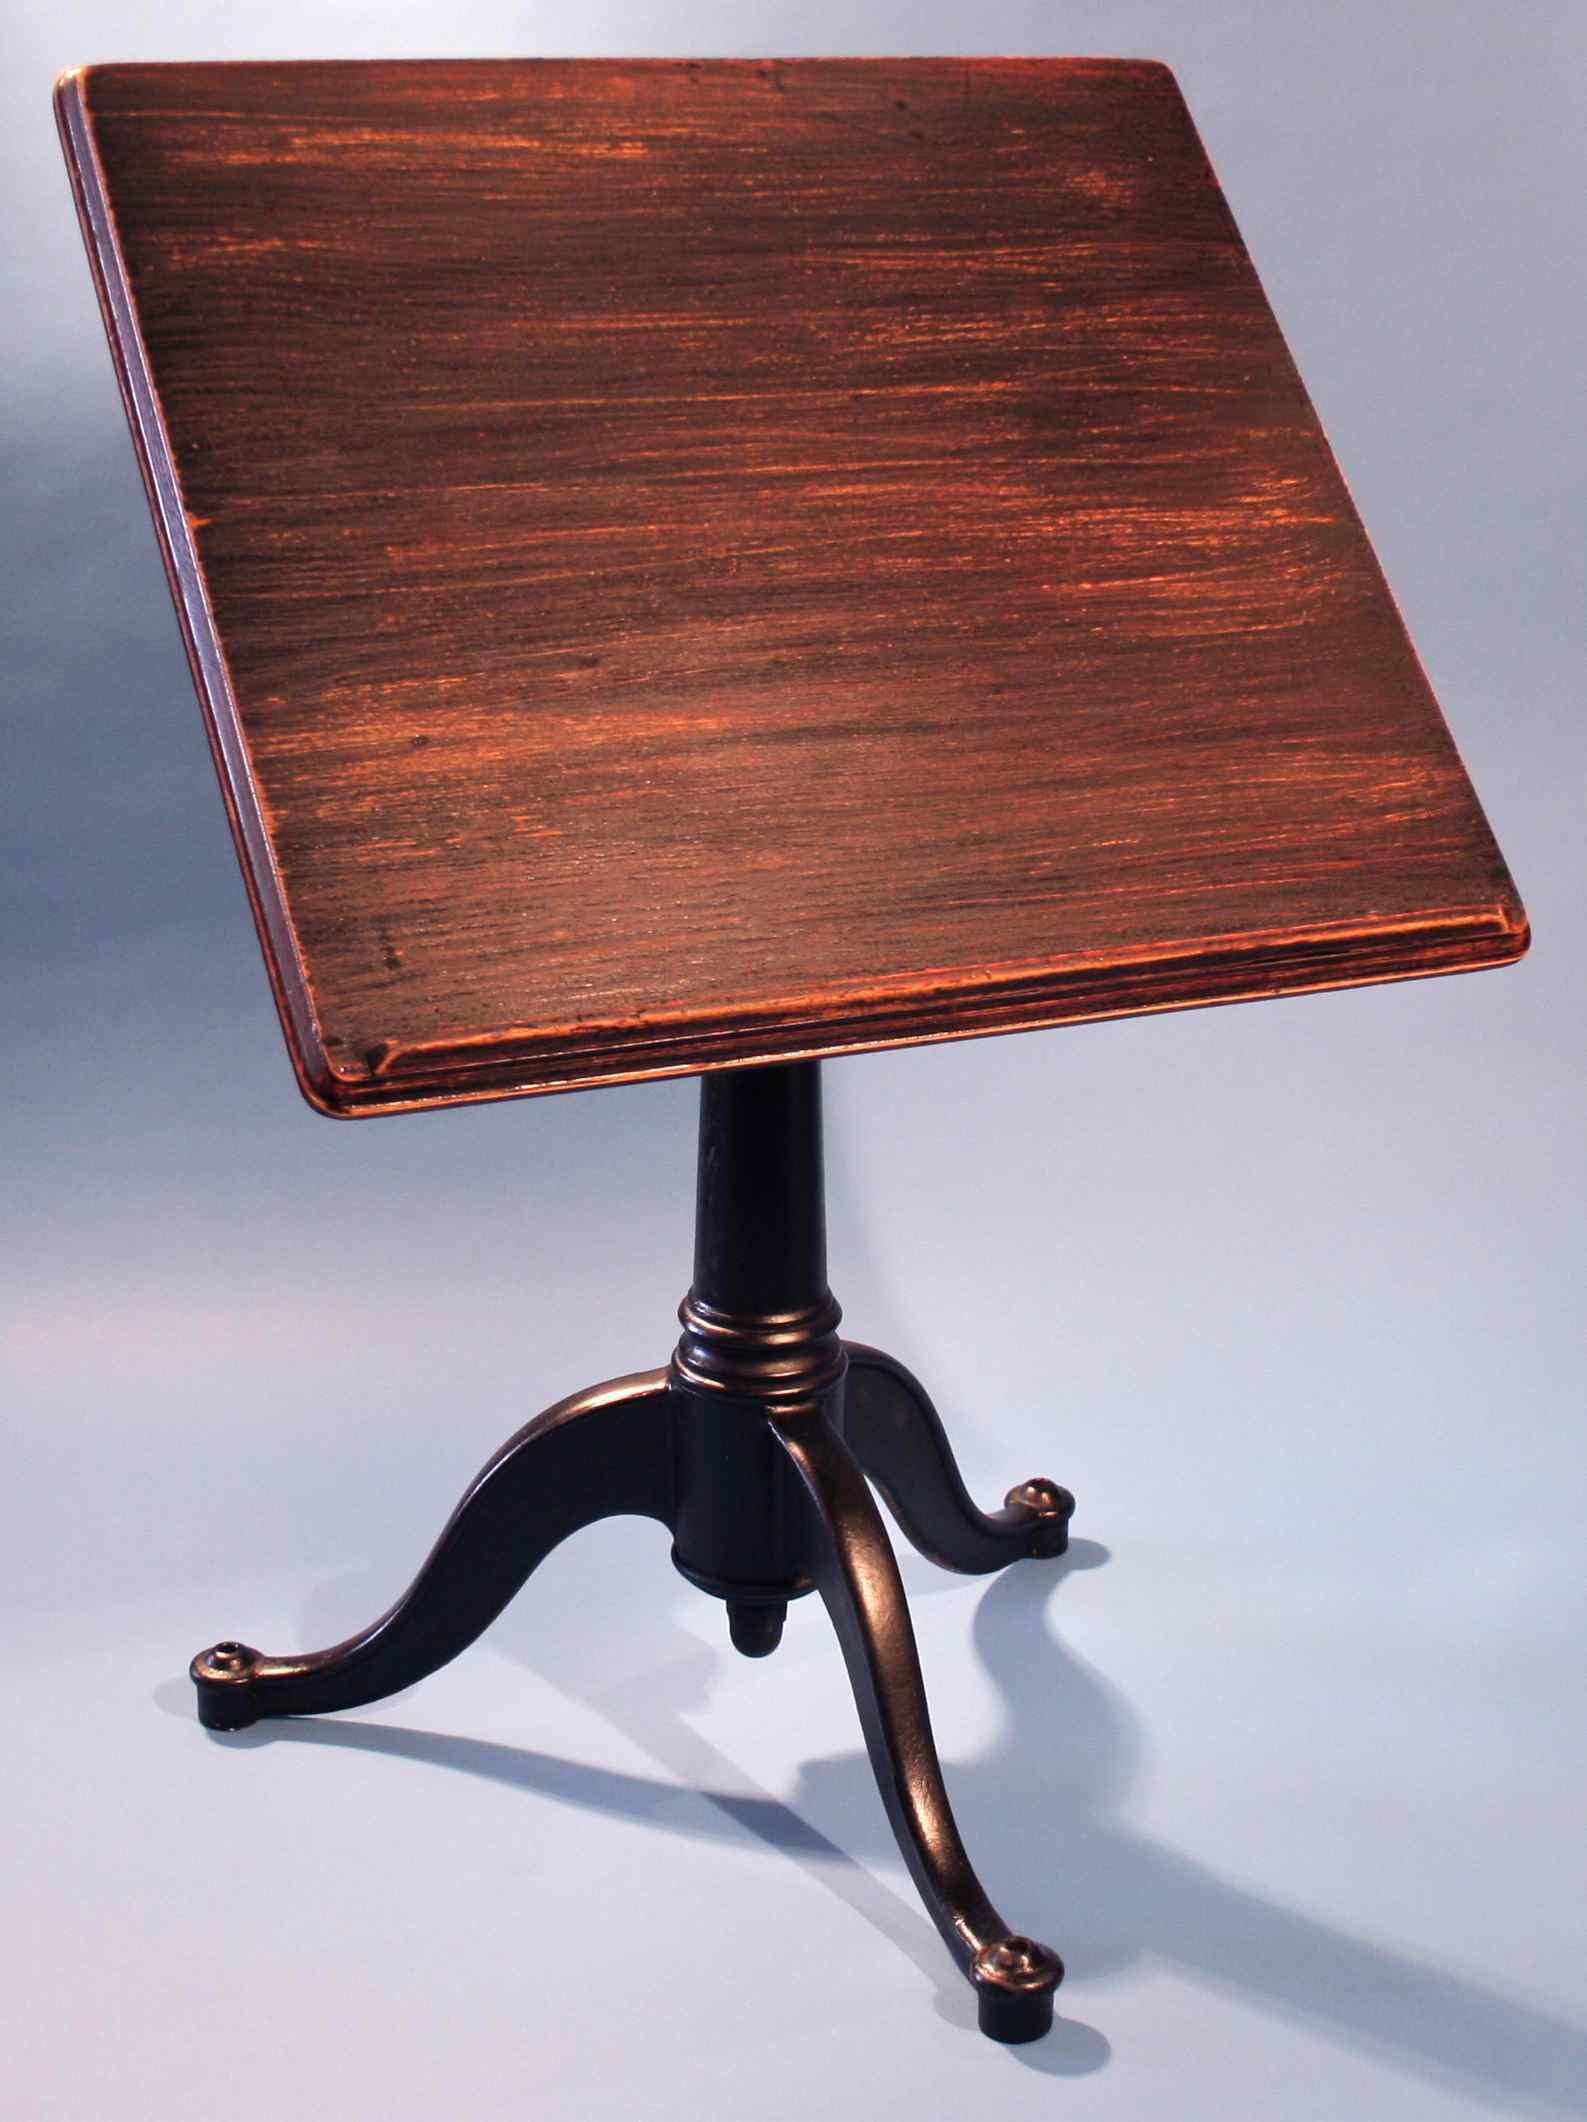 Old Drafting Table Homesfeed